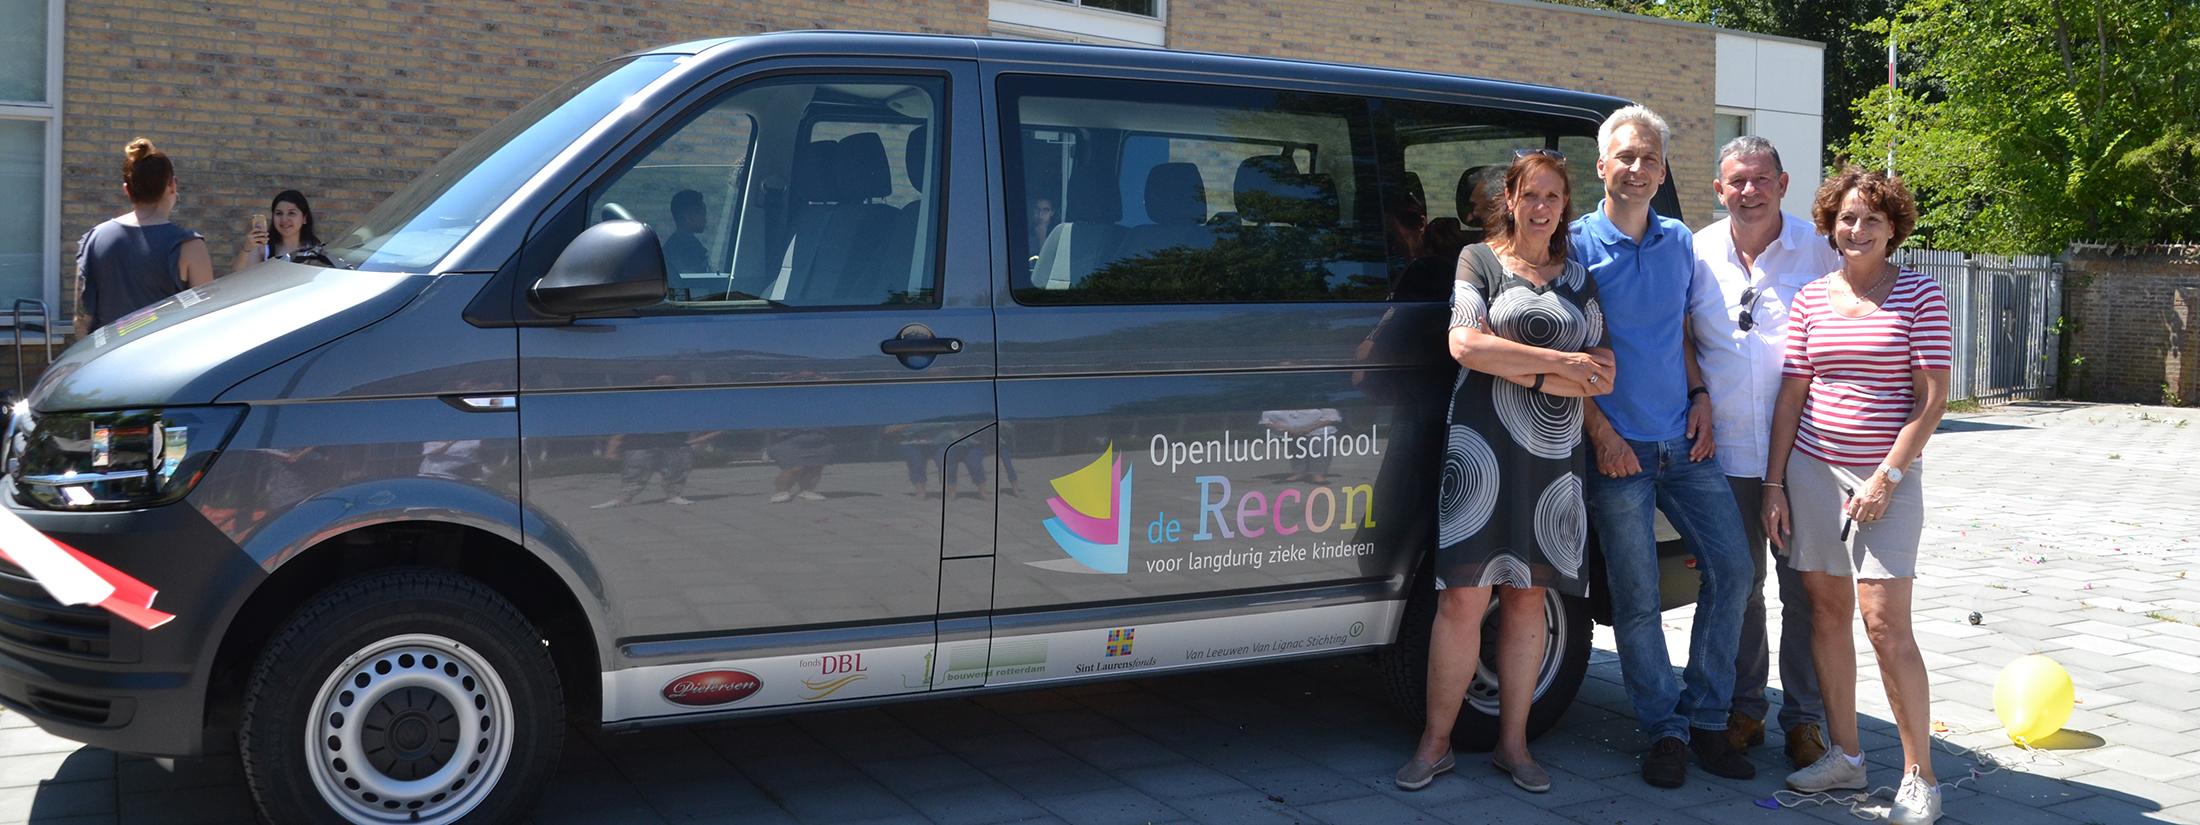 steun-ons-recon-school